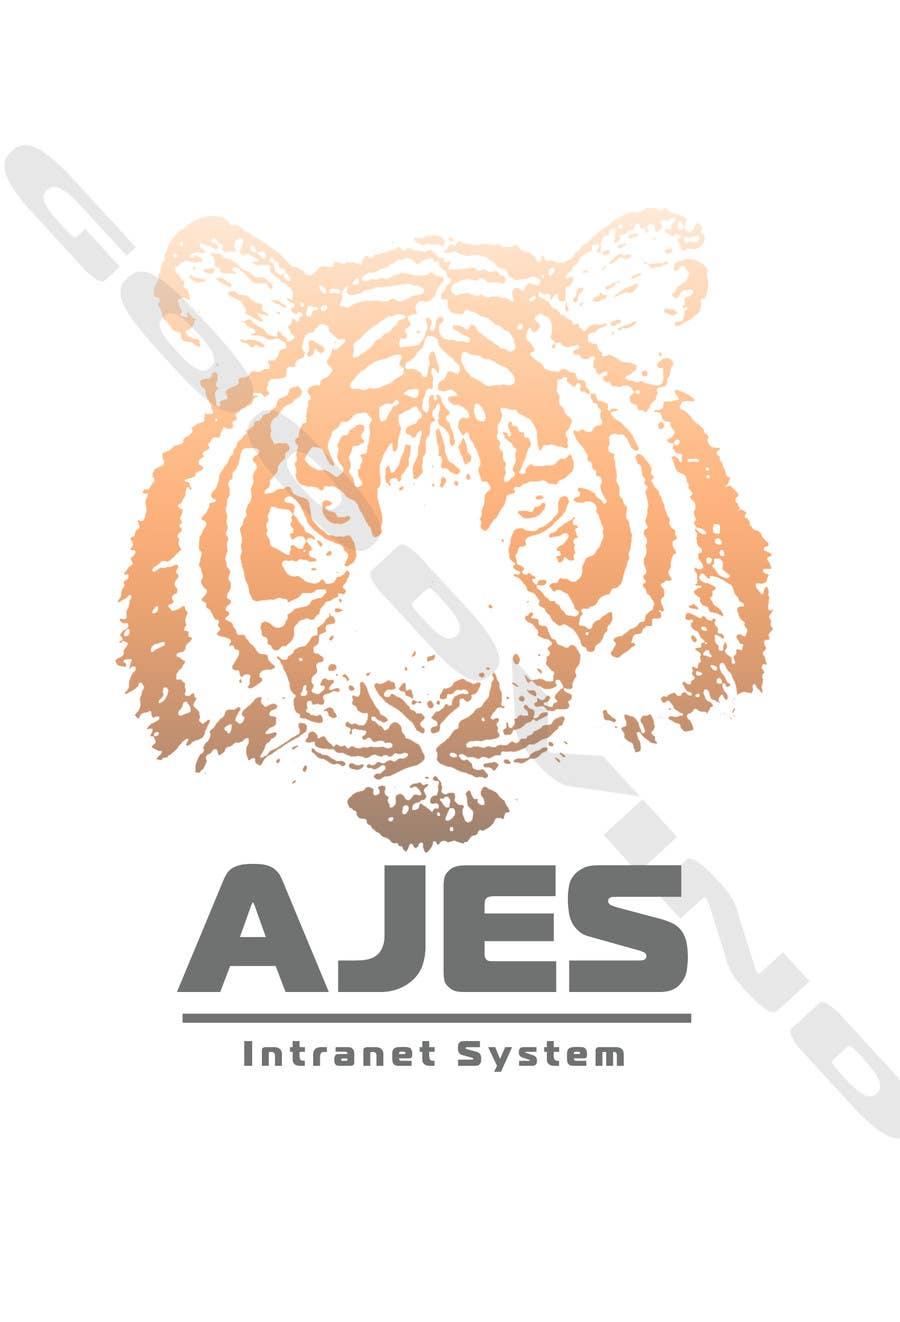 Bài tham dự cuộc thi #                                        7                                      cho                                         Design a Logo for AJES Intranet System